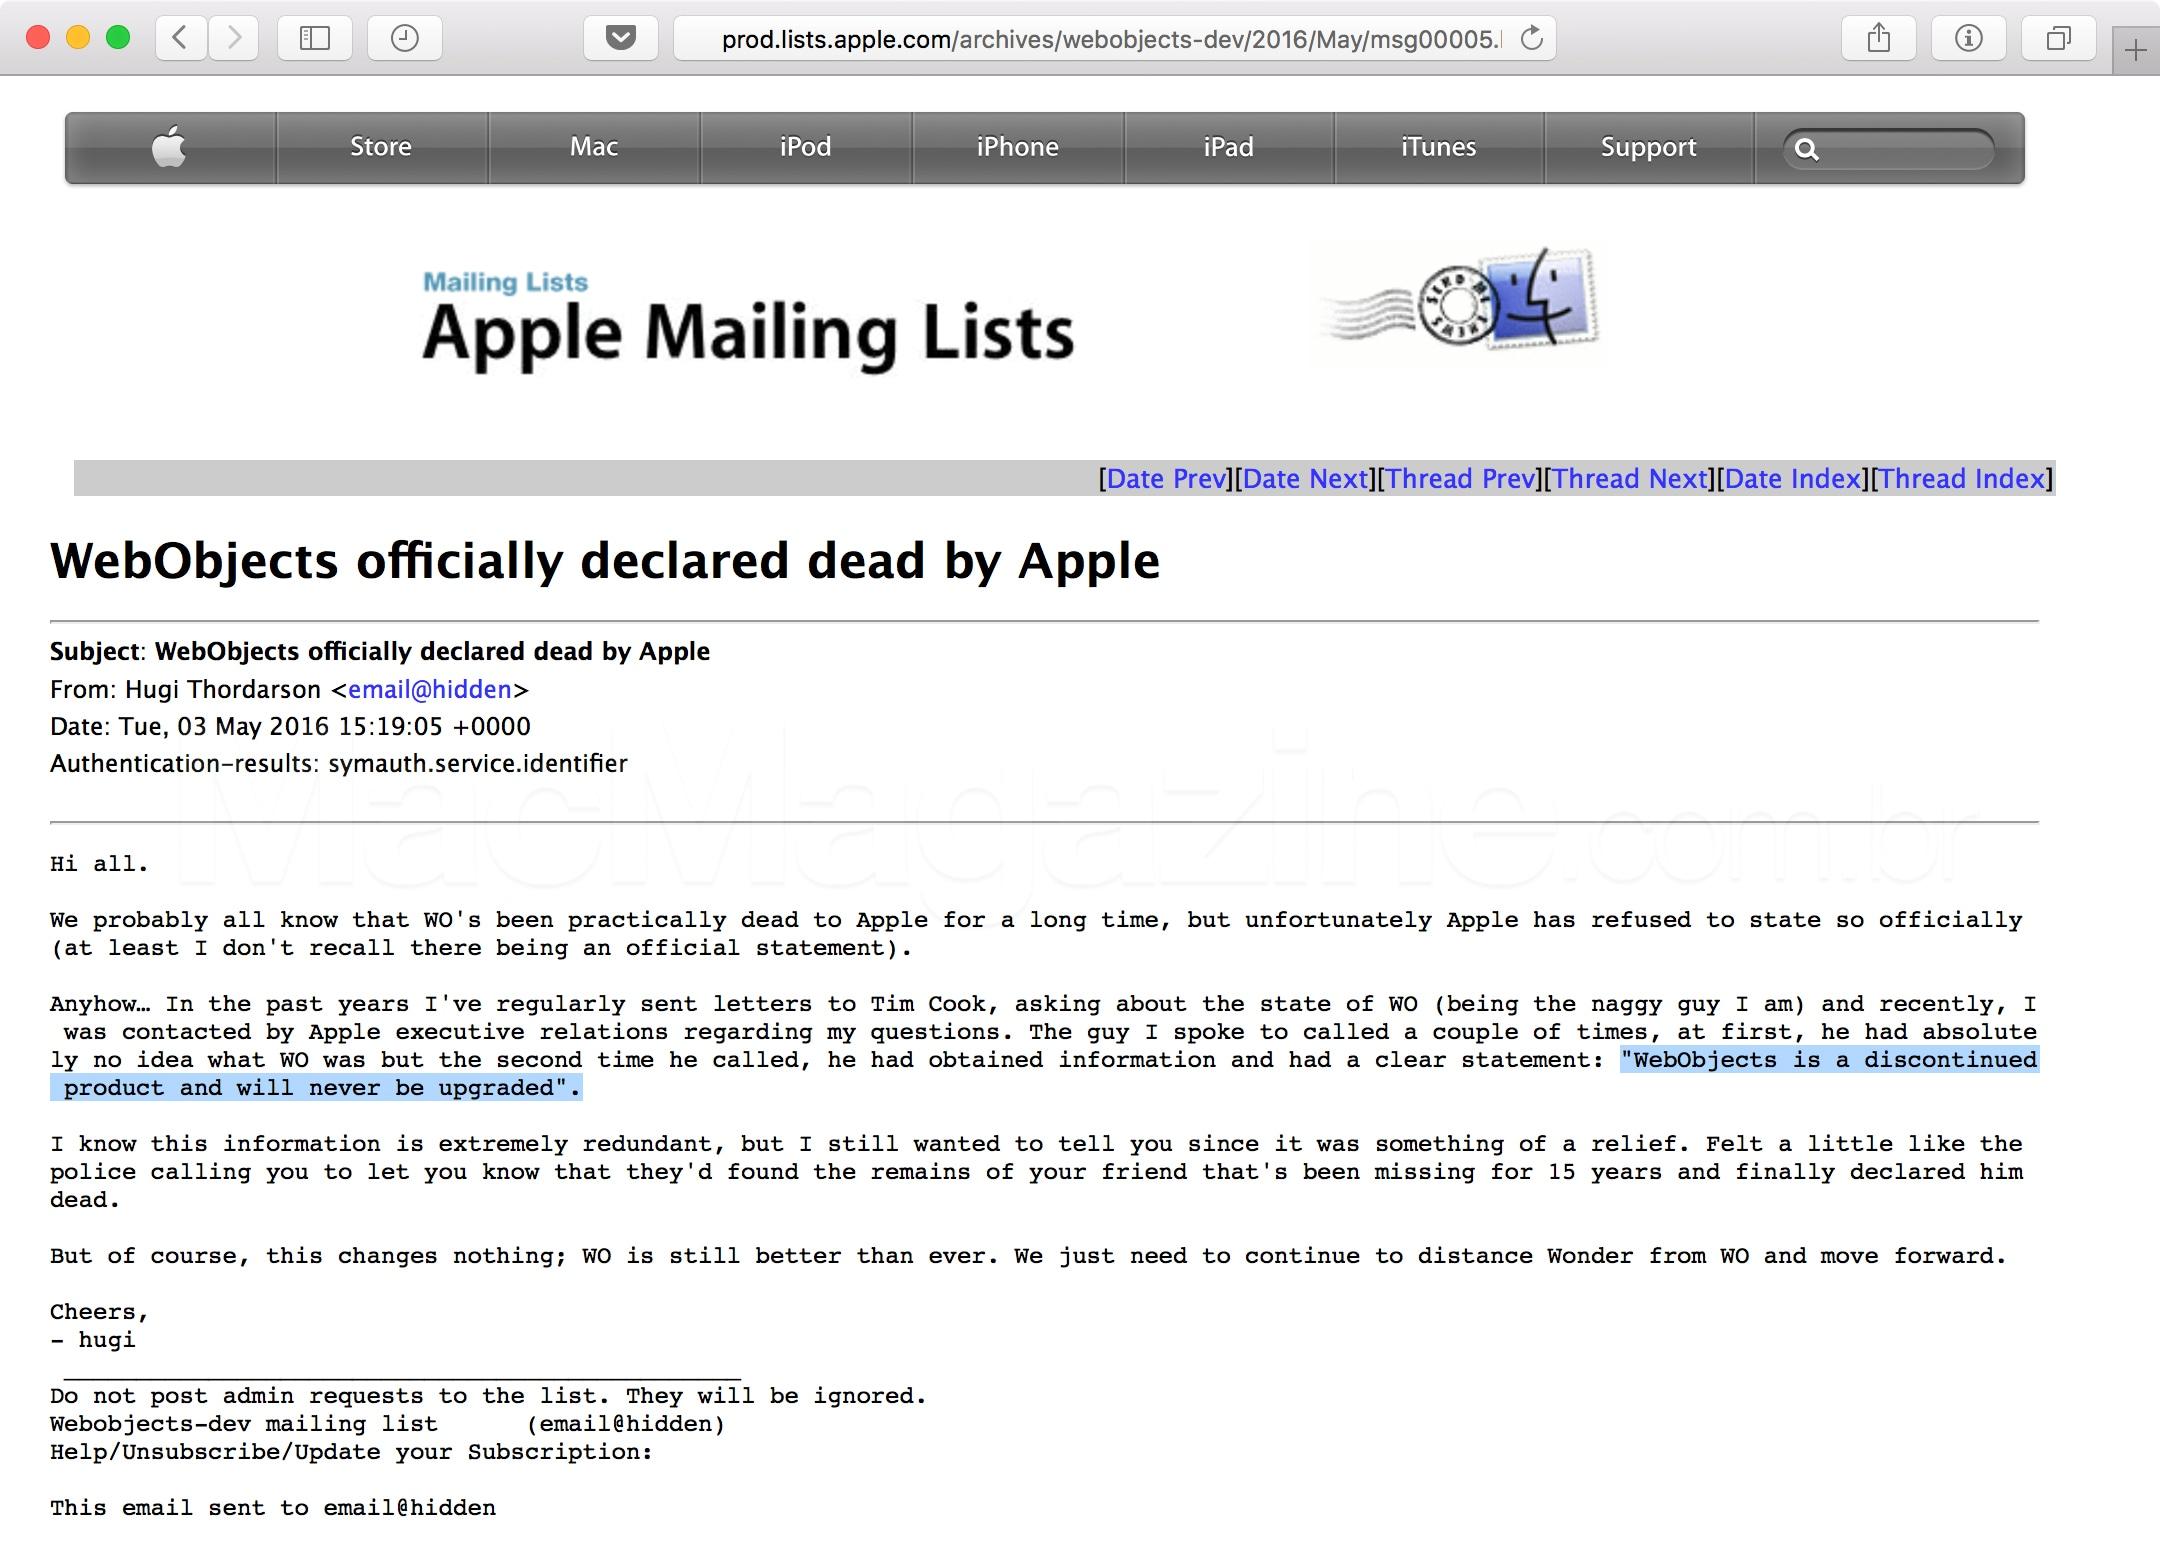 Email sobre o fim do WebObjects